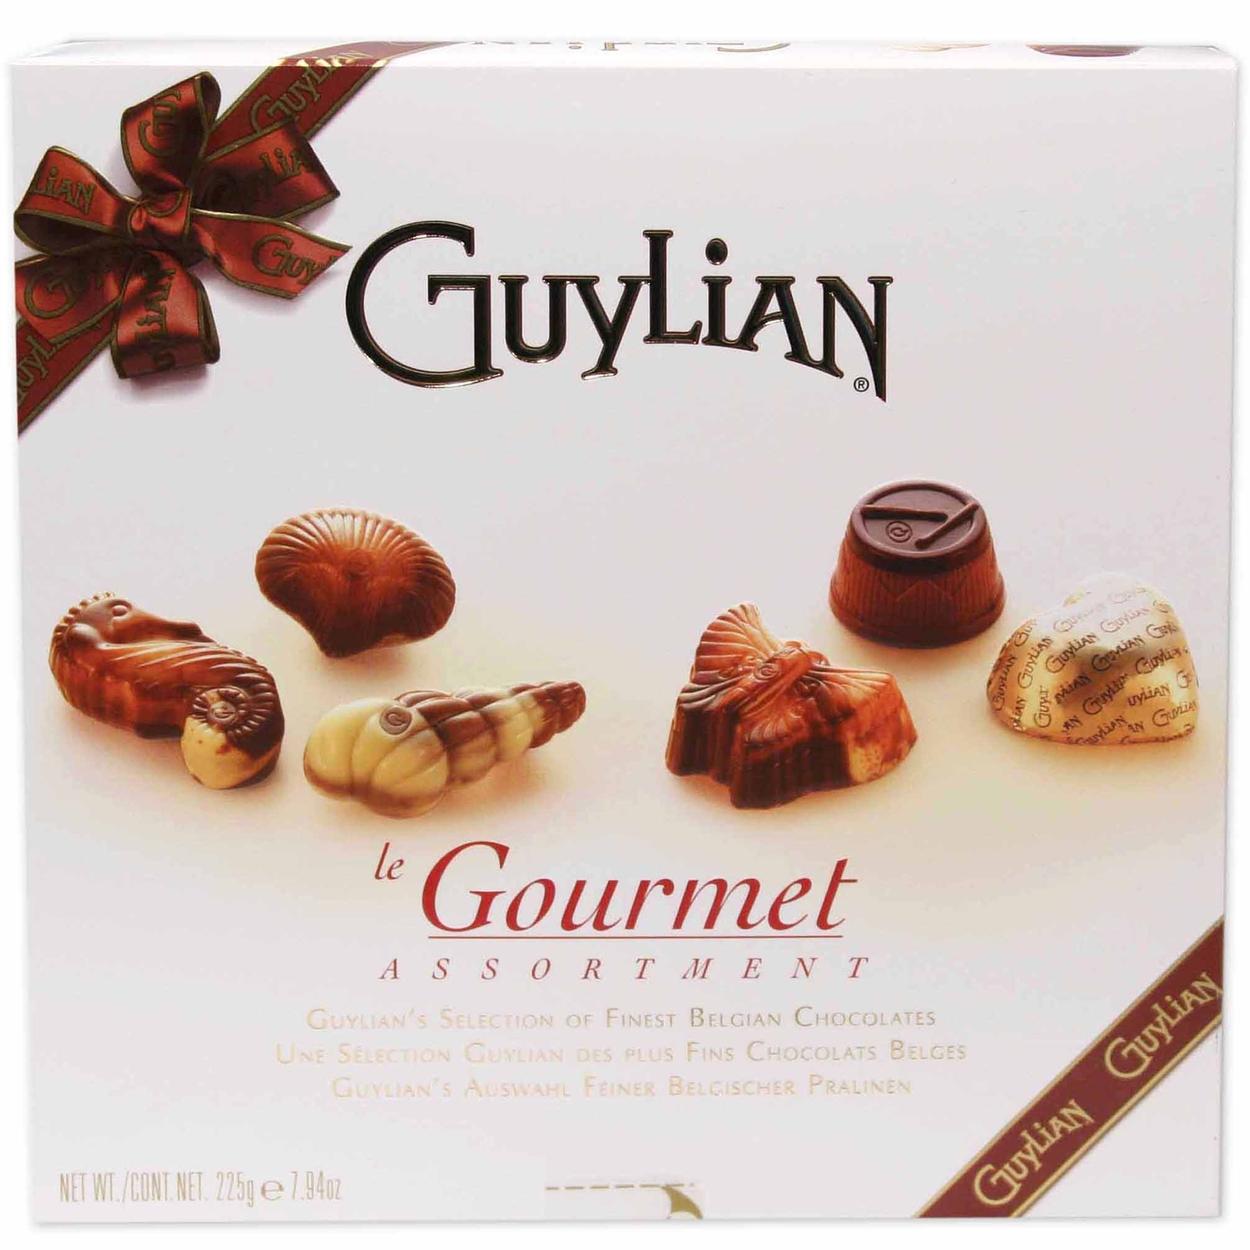 Le Gourmet Assortment Chocolate Gift Box • Guylian Belgian ...